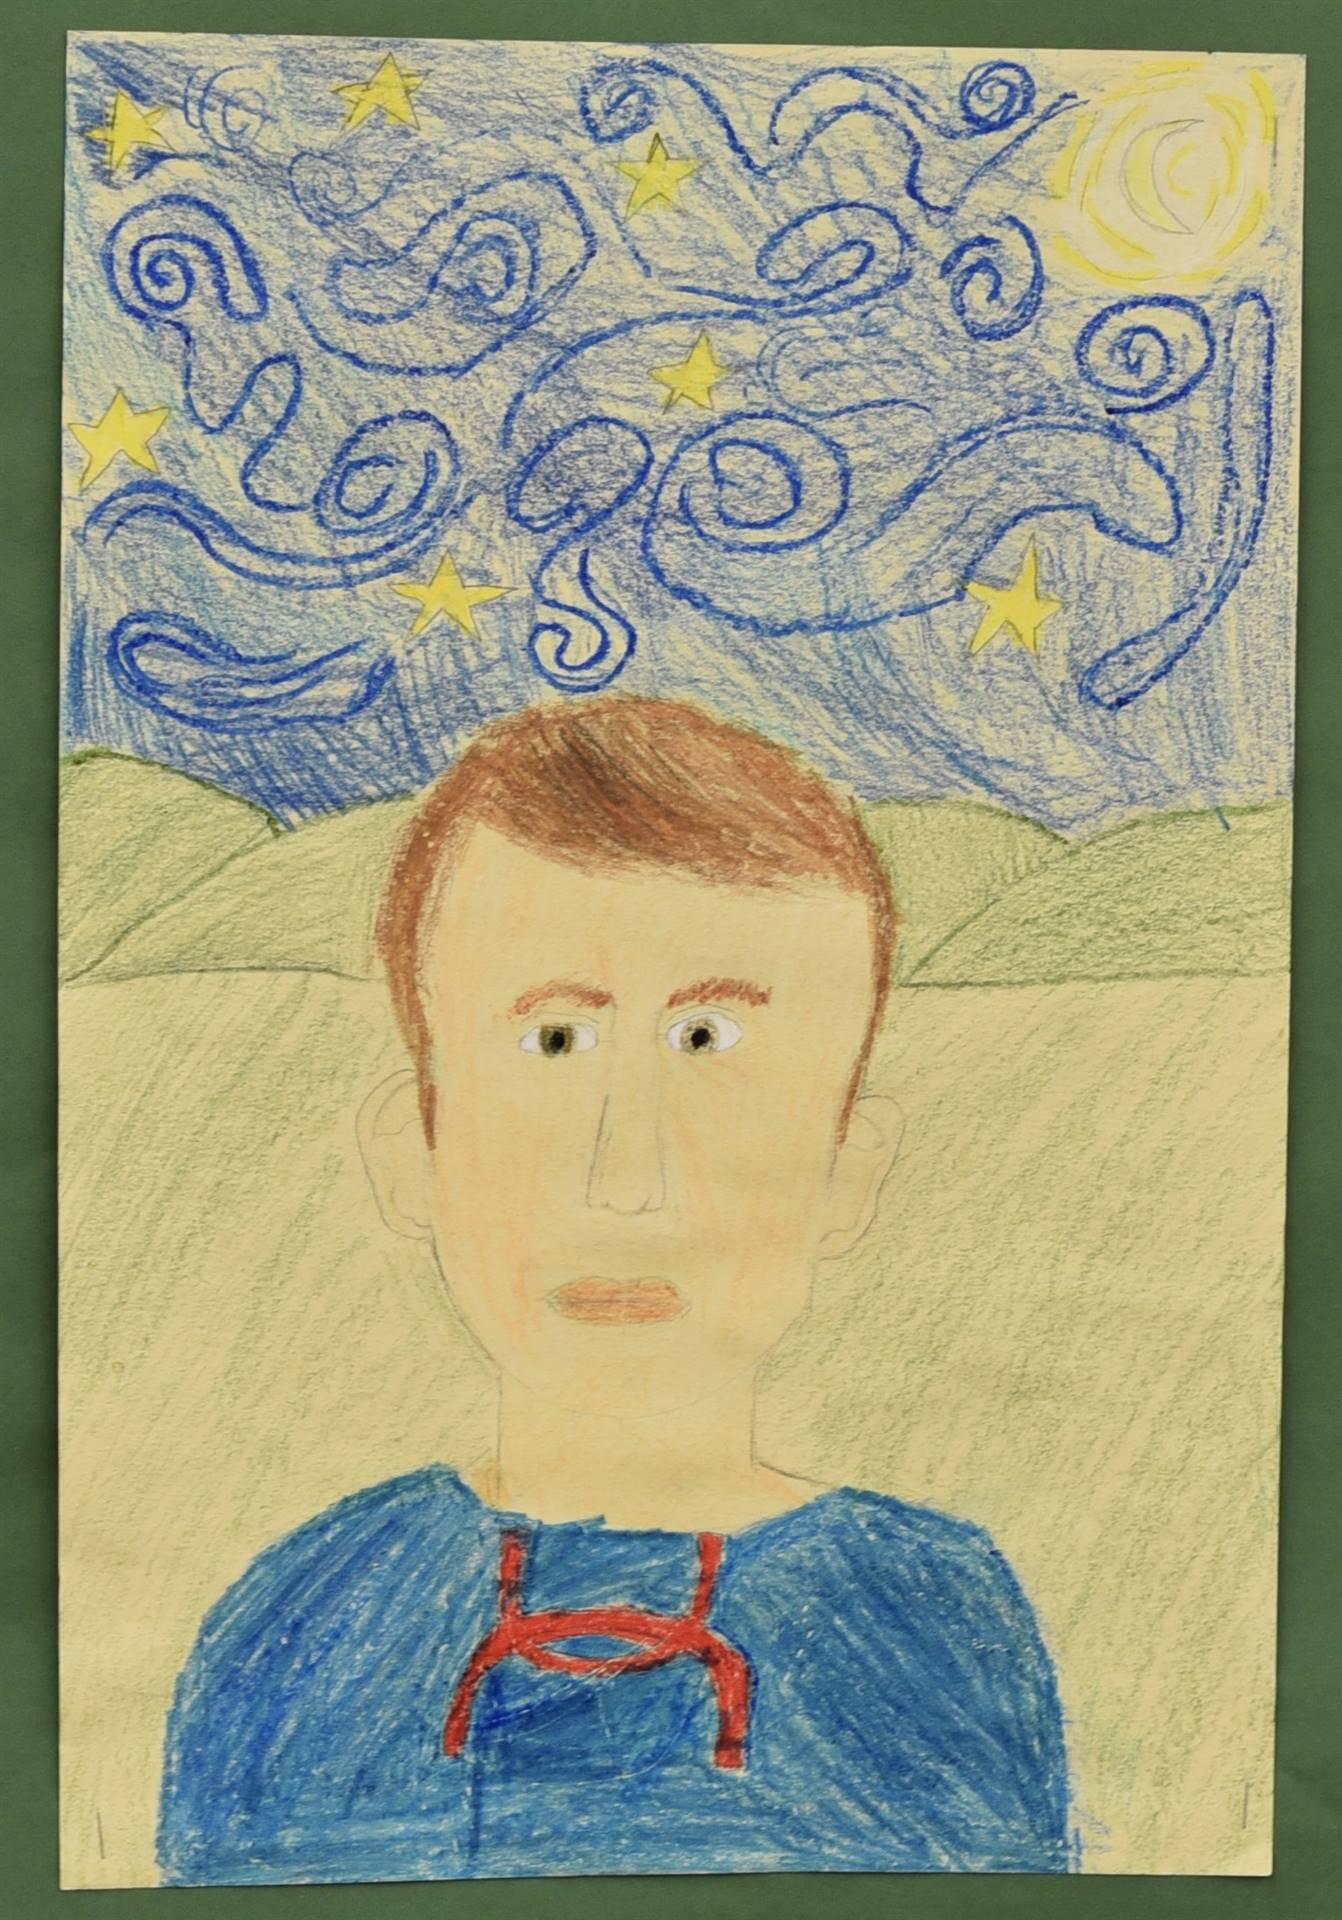 Brecksville-Broadview Hts. Middle School Art Projects 181